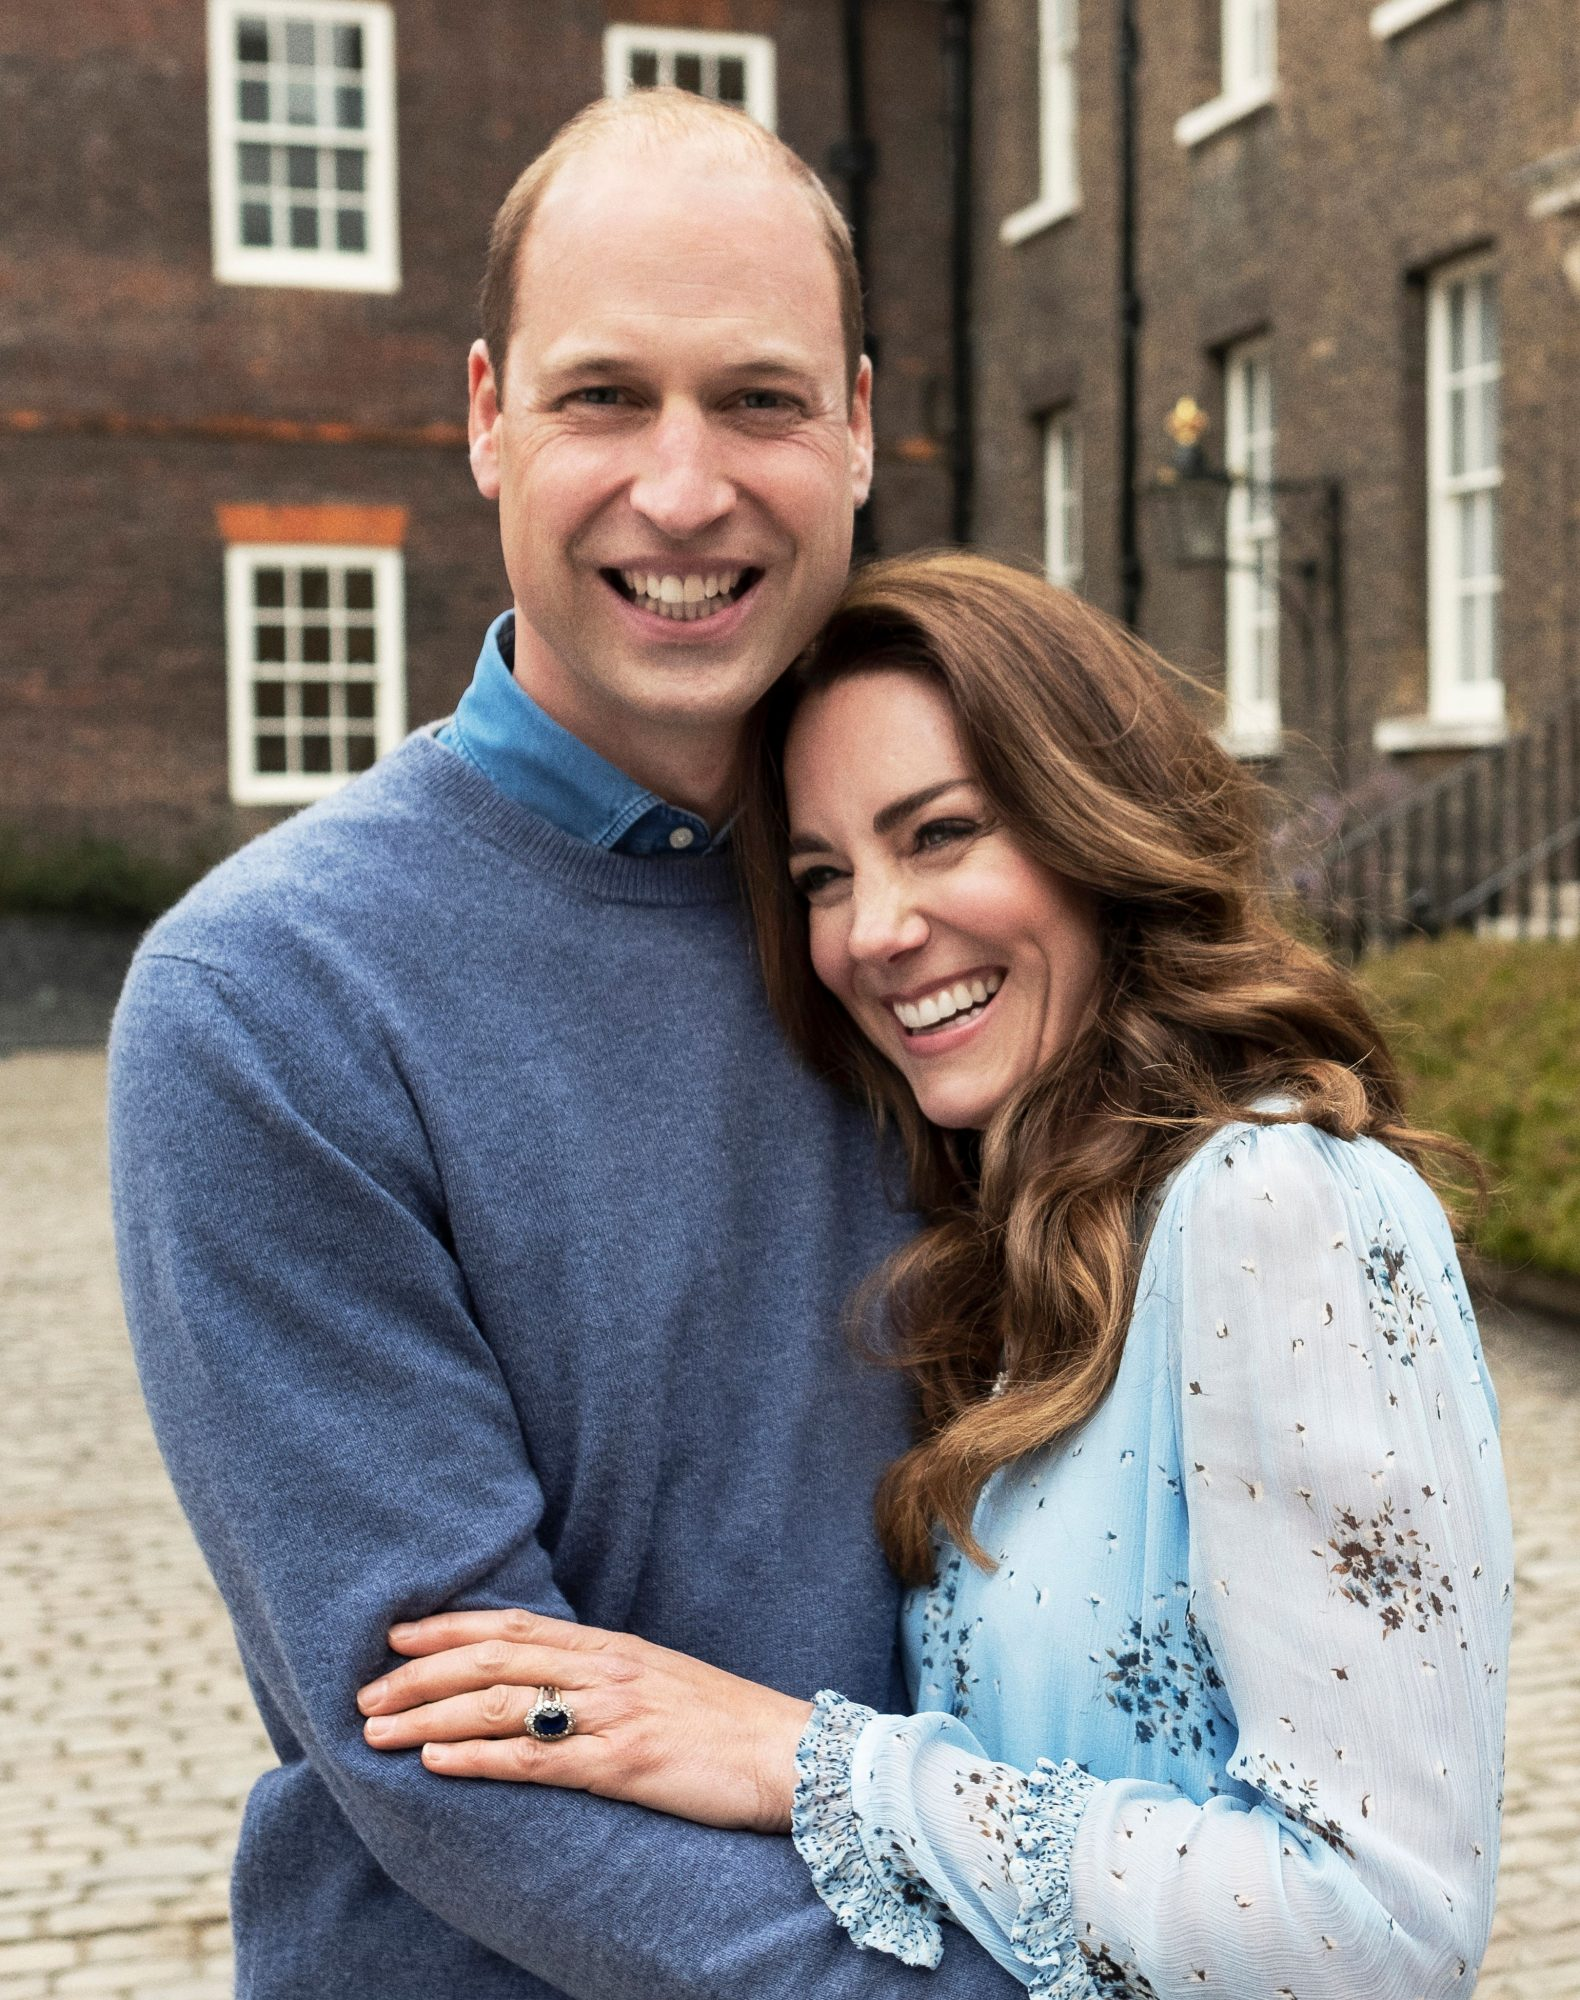 Prince William y Kate Middleton 10th Wedding Anniversary of Duke and Duchess of Cambridge, Kensington Palace, London, UK - 28 Apr 2021